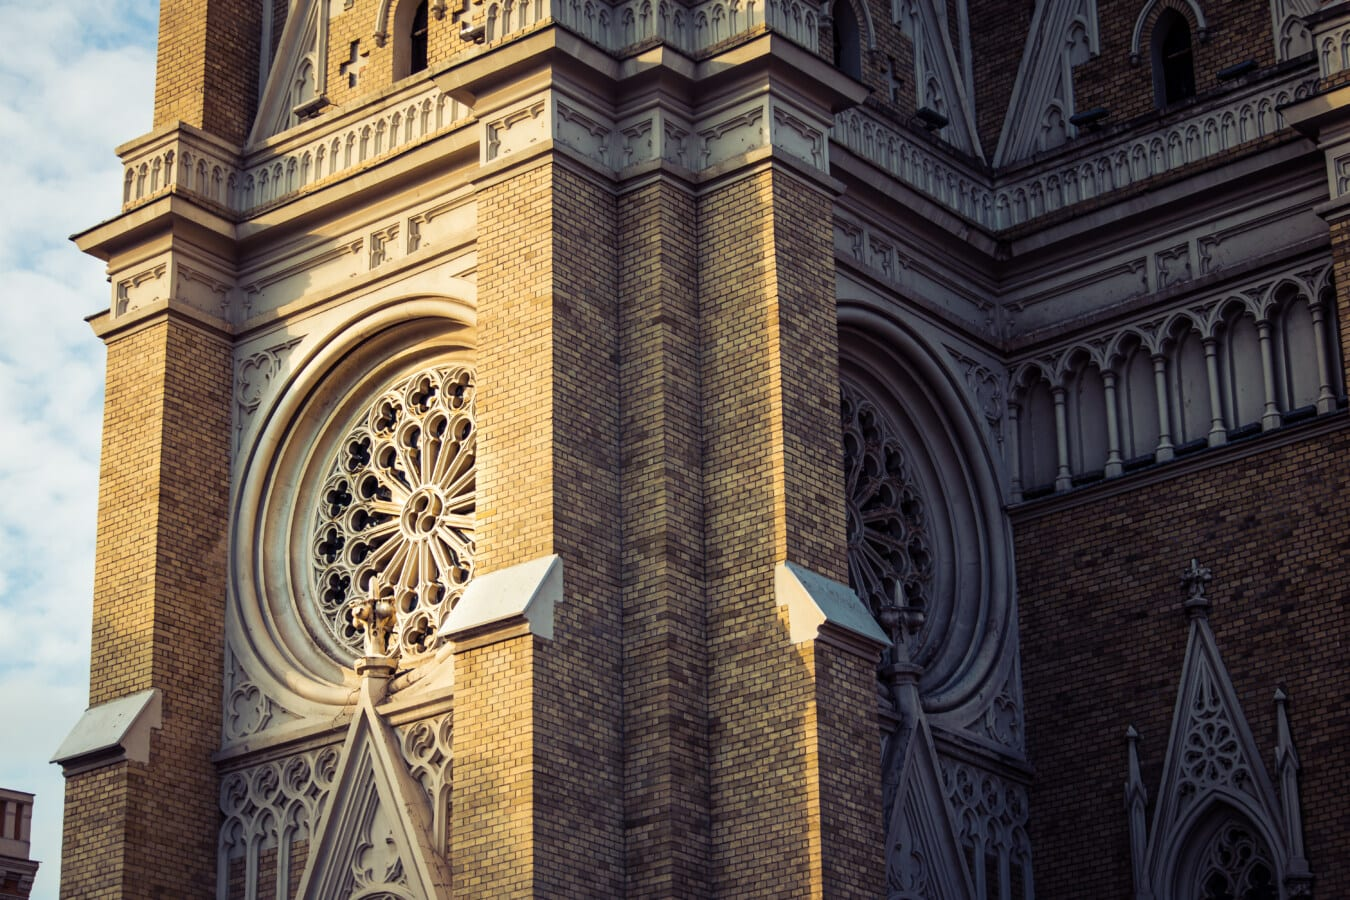 walls, cathedral, facade, catholic, light brown, bricks, shadow, corner, perspective, sunlight